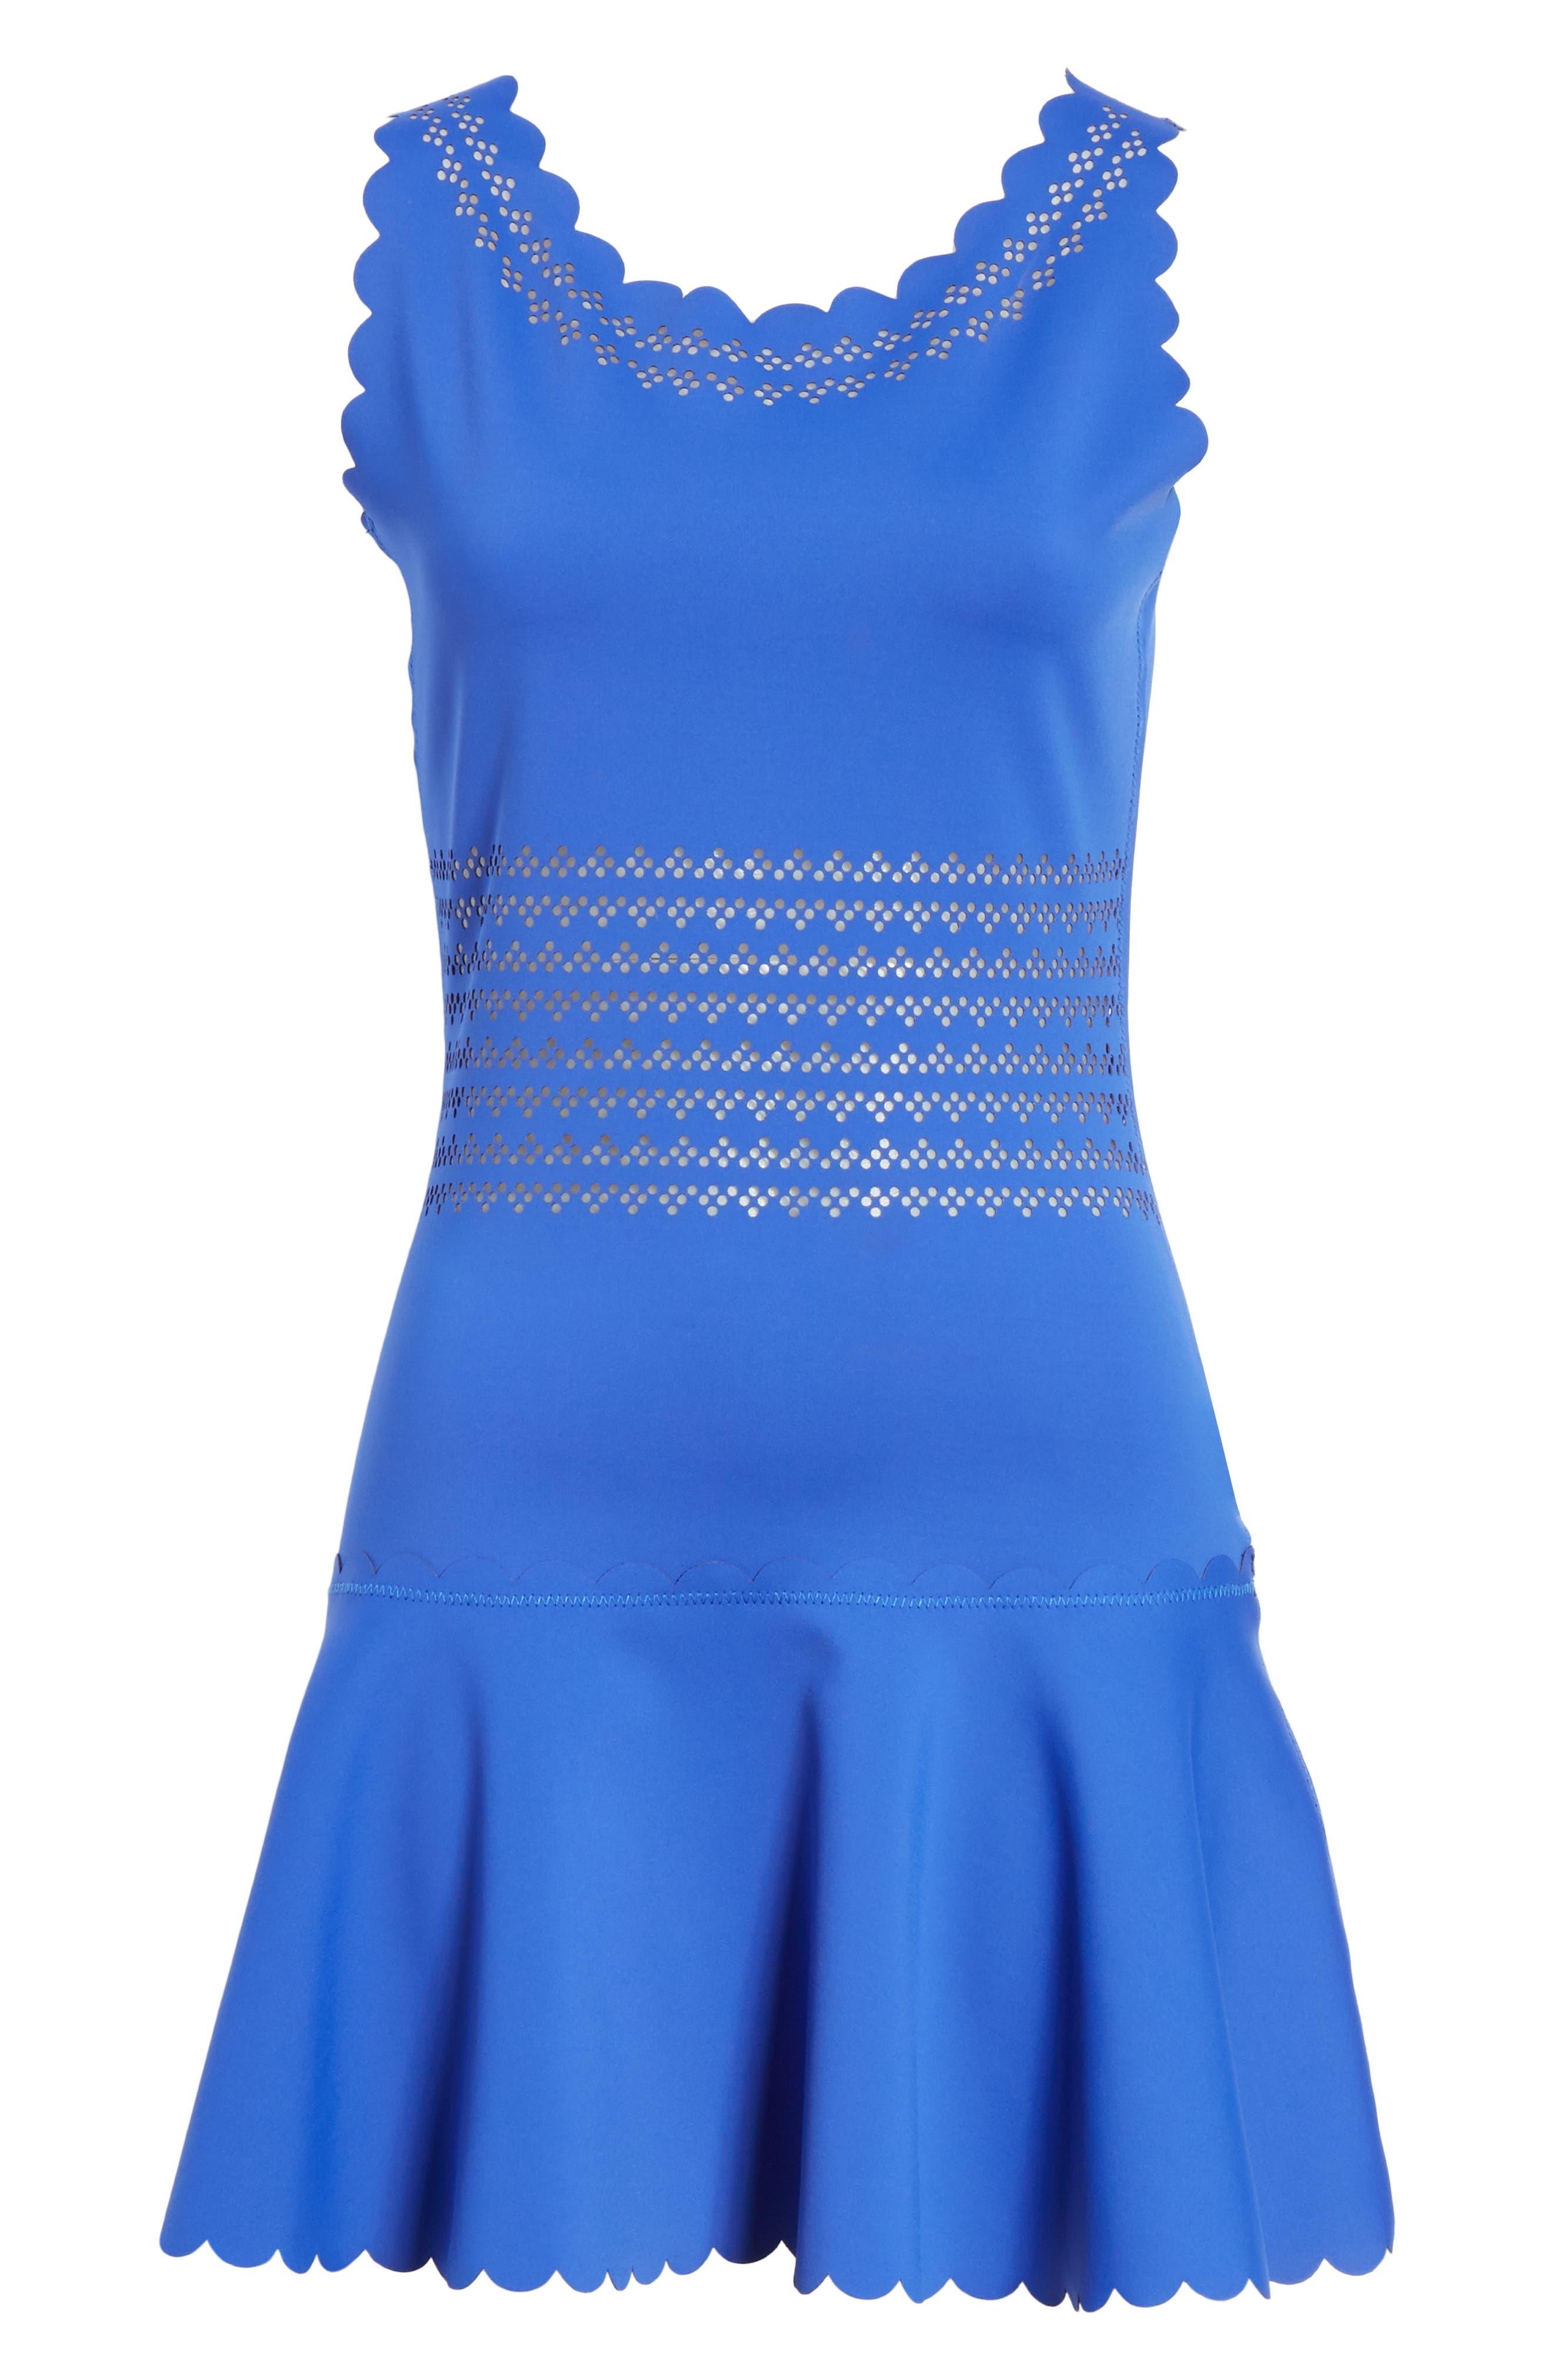 Center Court Tennis Dress,                             Alternate thumbnail 8, color,                             BLUE